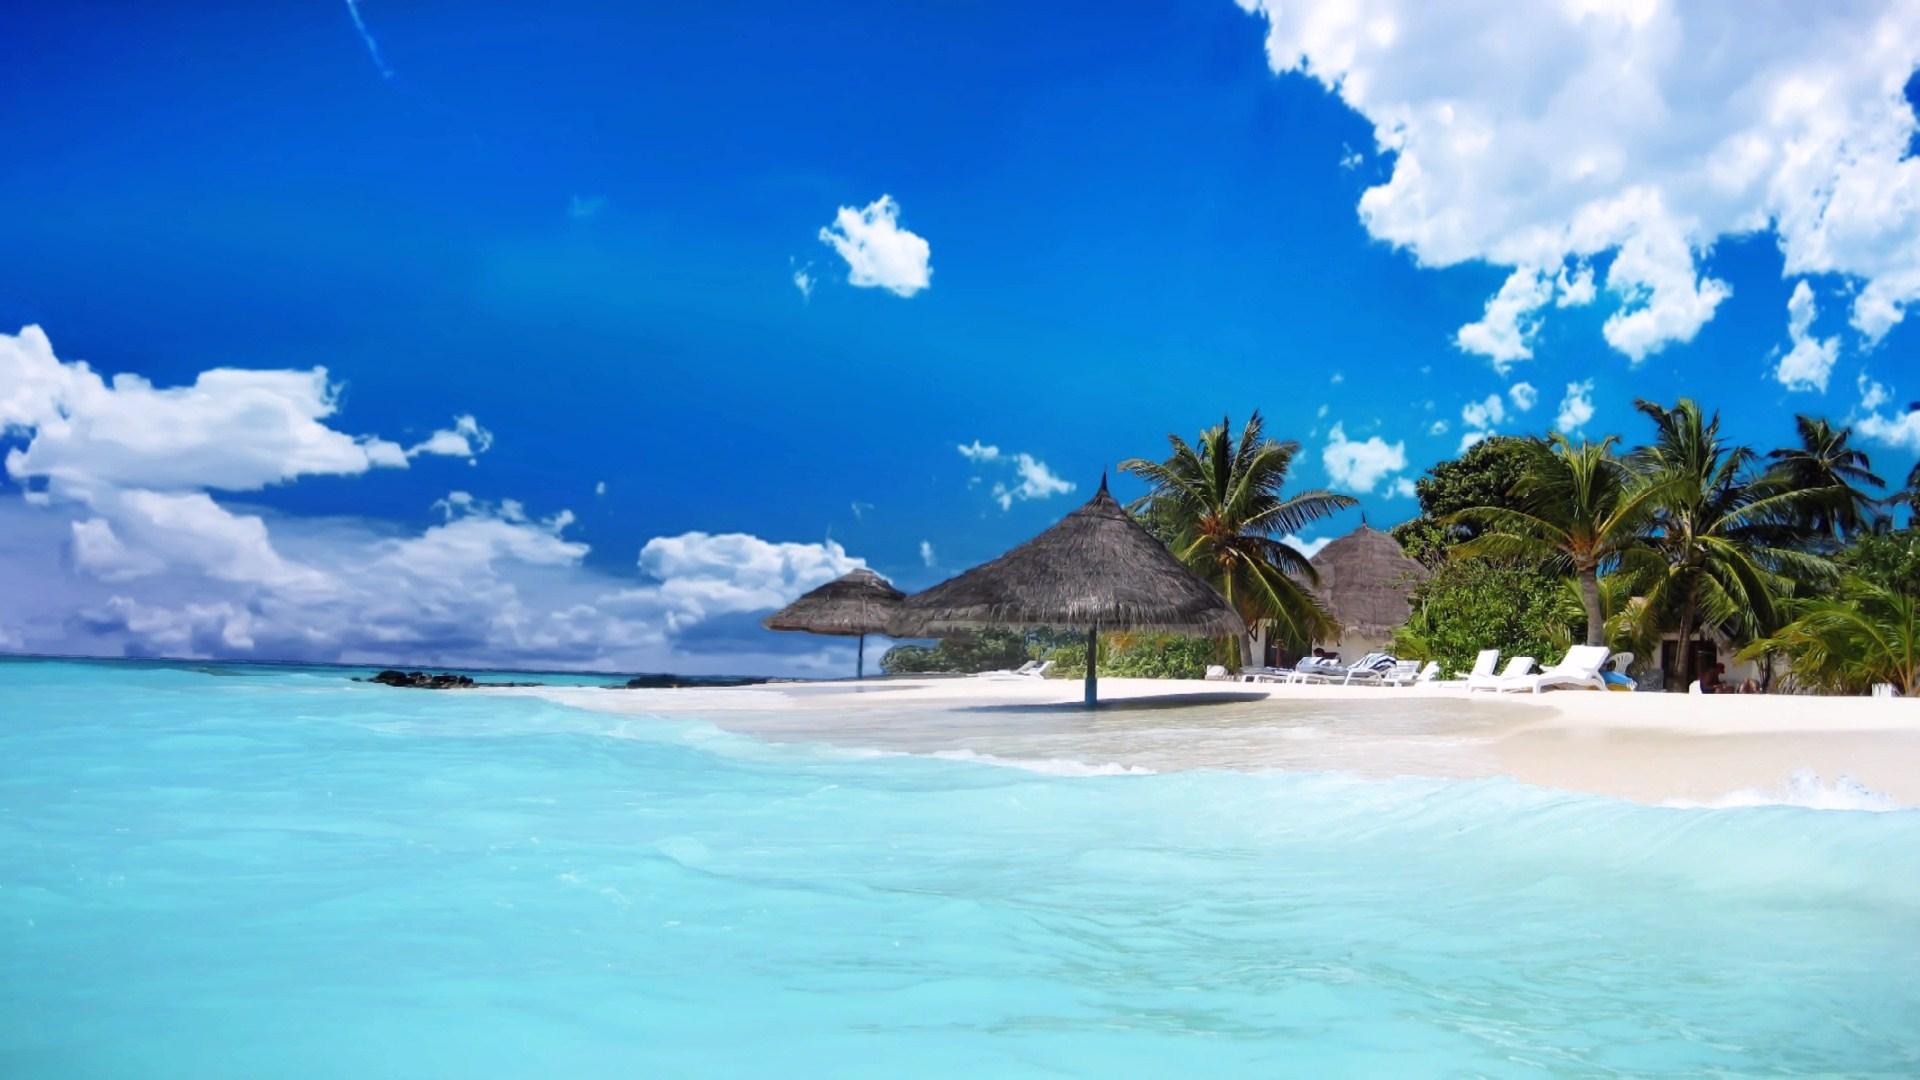 10 Top Sunny Beach Wallpaper Hd Full Hd 1920 1080 For Pc: HD Landscape Beach HD Wallpaper